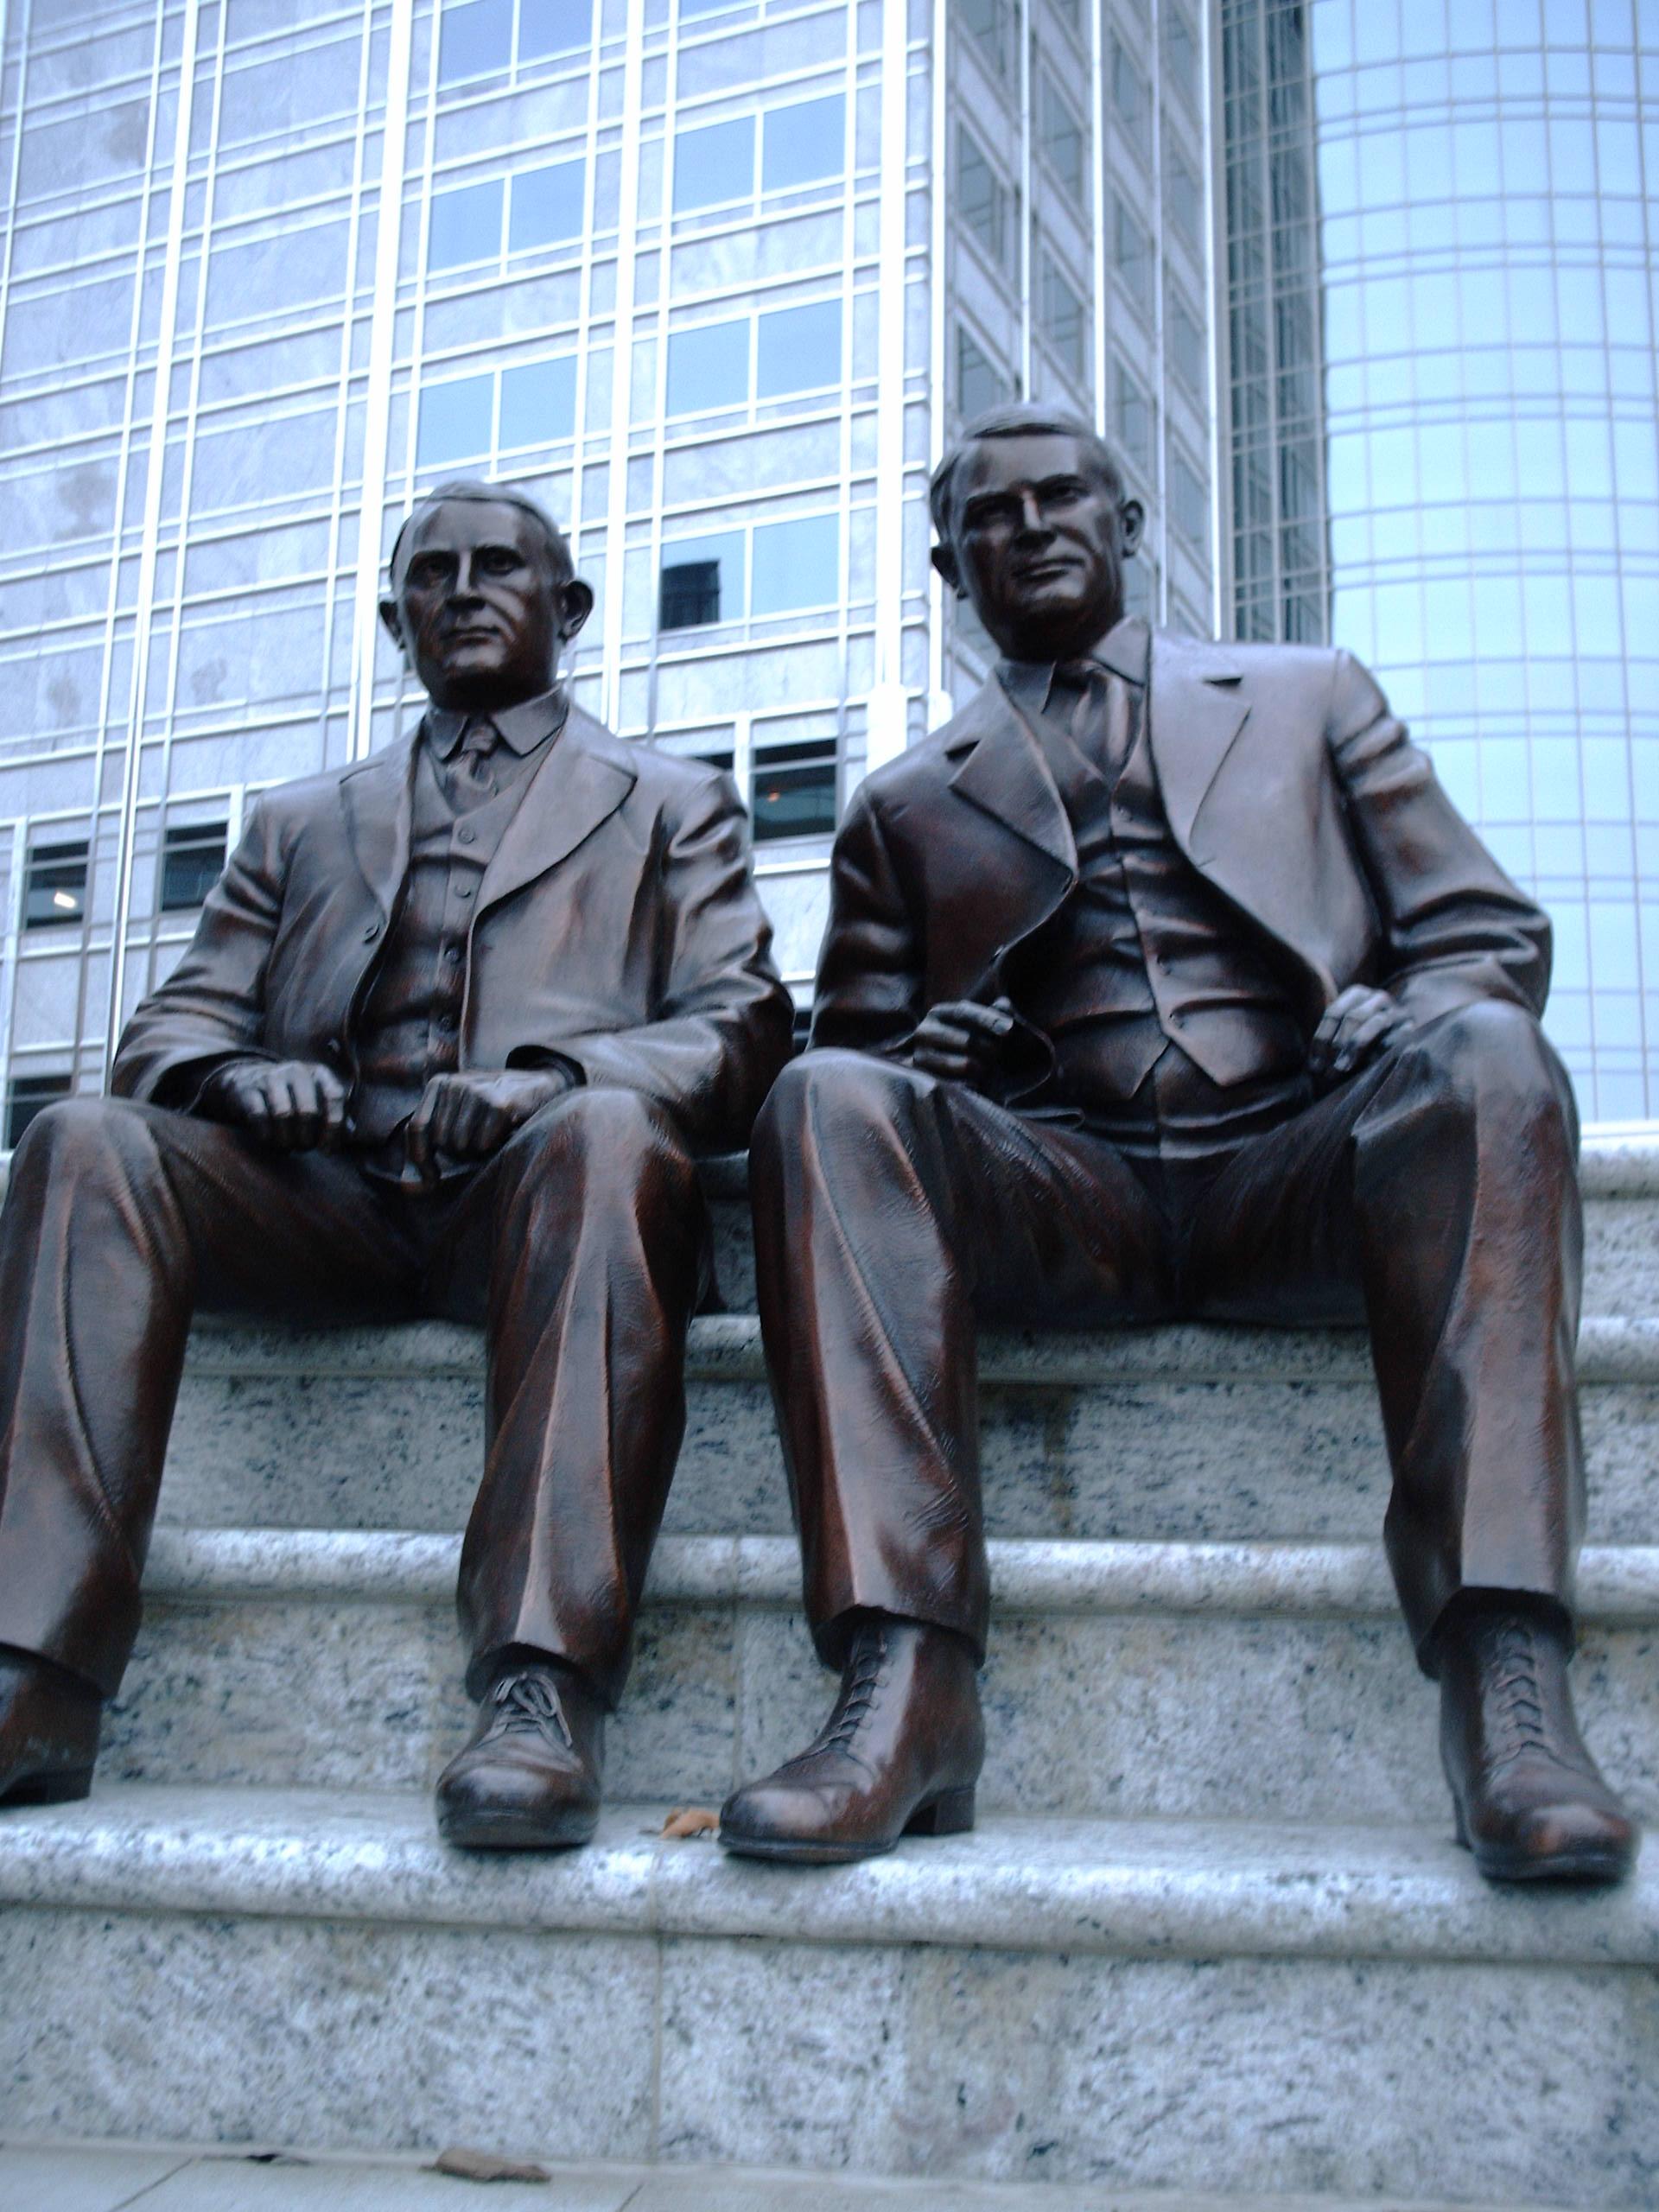 http://upload.wikimedia.org/wikipedia/commons/1/19/SeatedMayoBrothersStatues2005.JPG